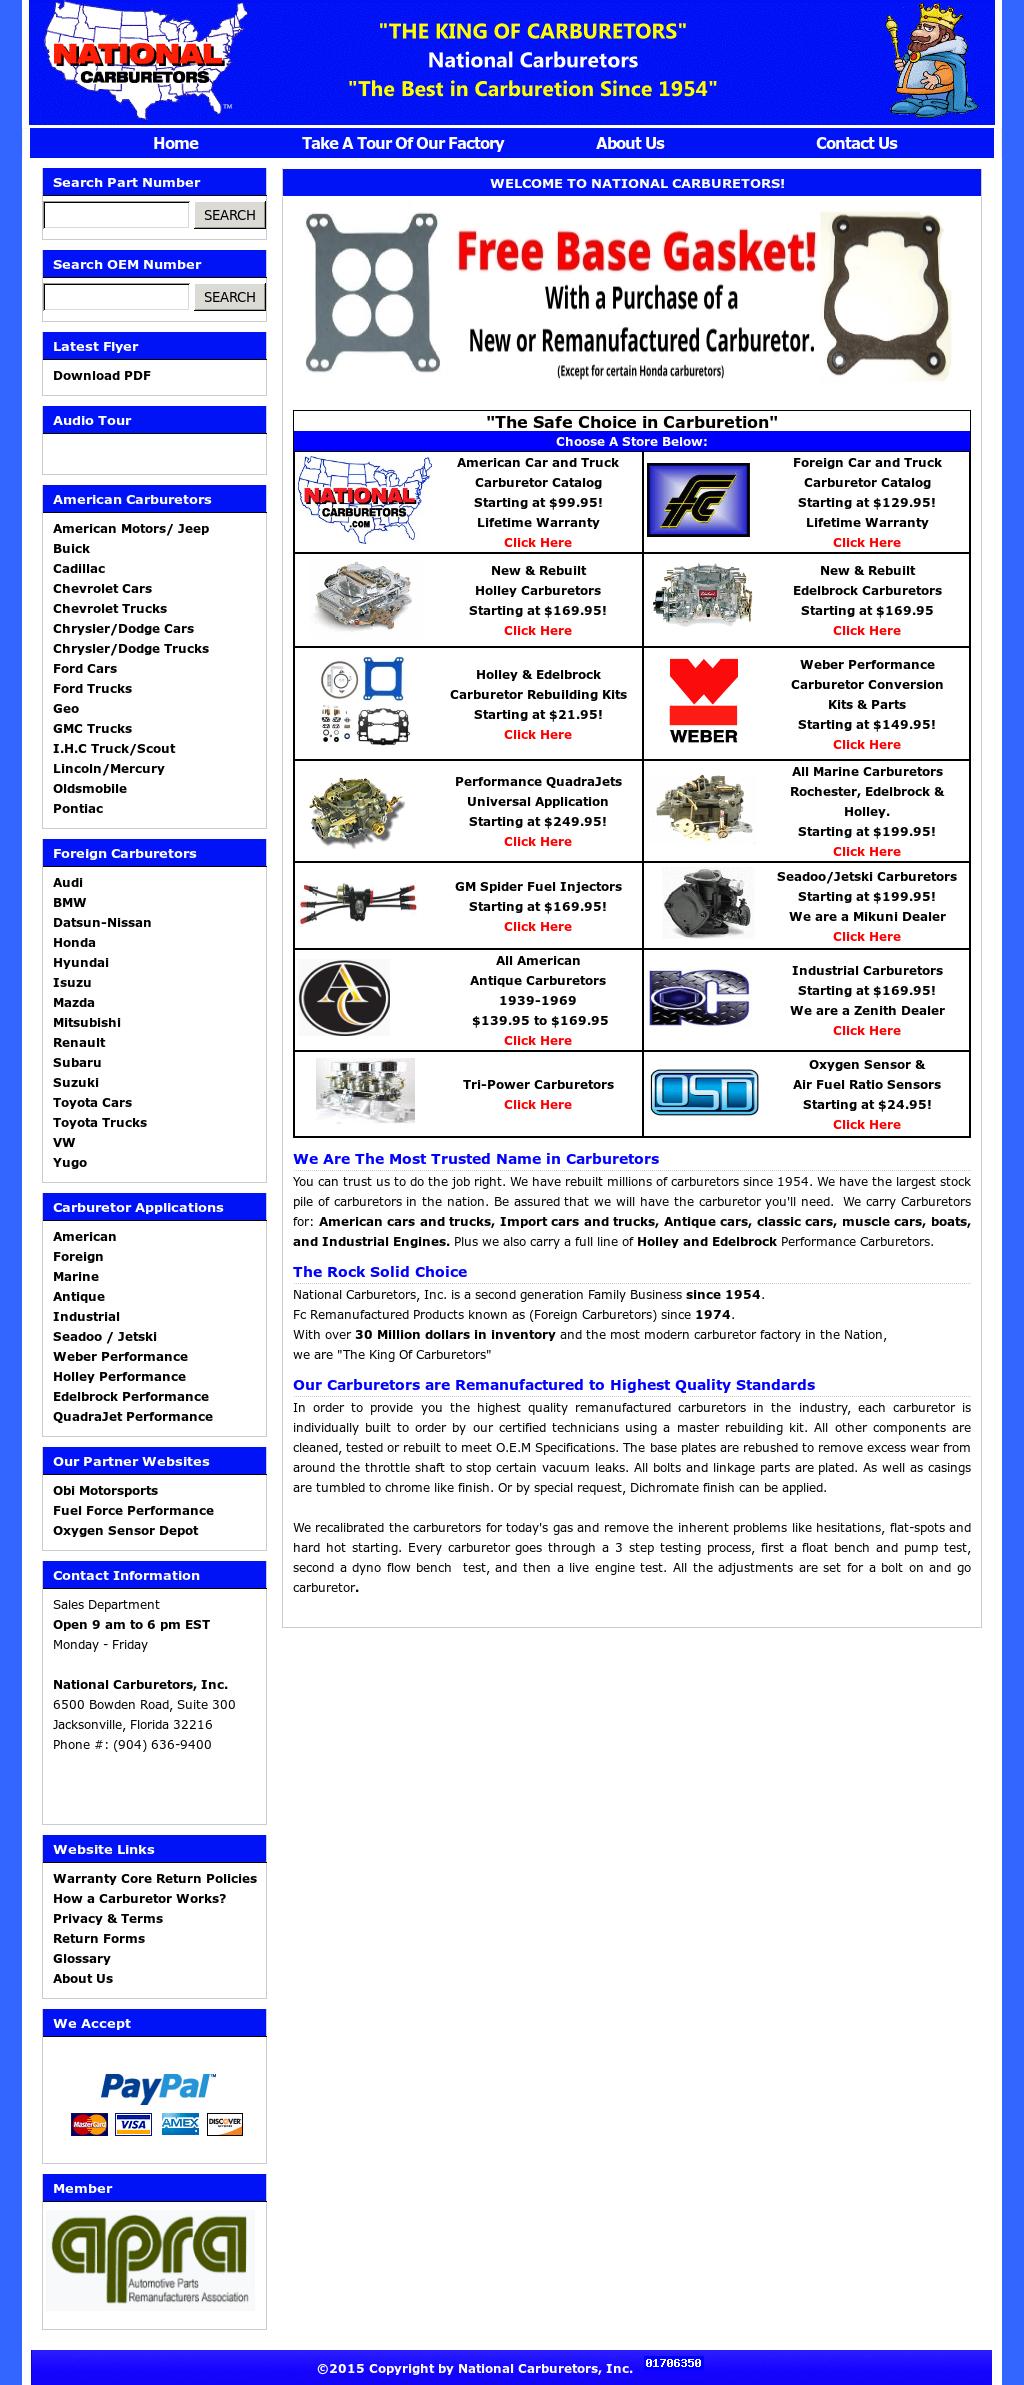 National Carburetors Competitors, Revenue and Employees